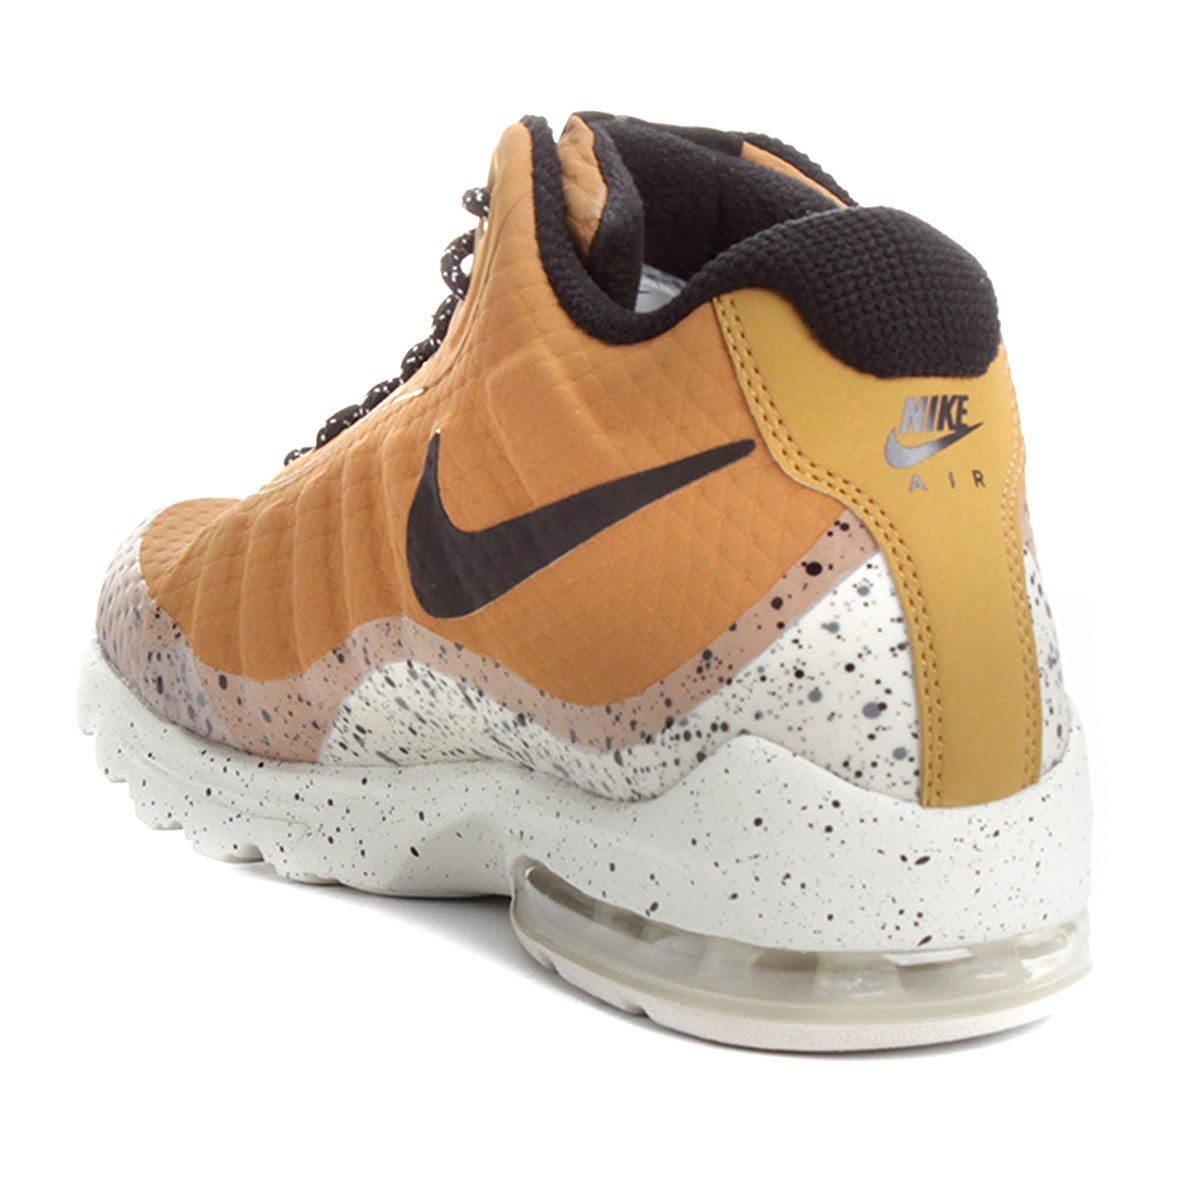 Tênis Nike Air Max Invigor Mid Masculino - Compre Agora  3c8328b5fdb13